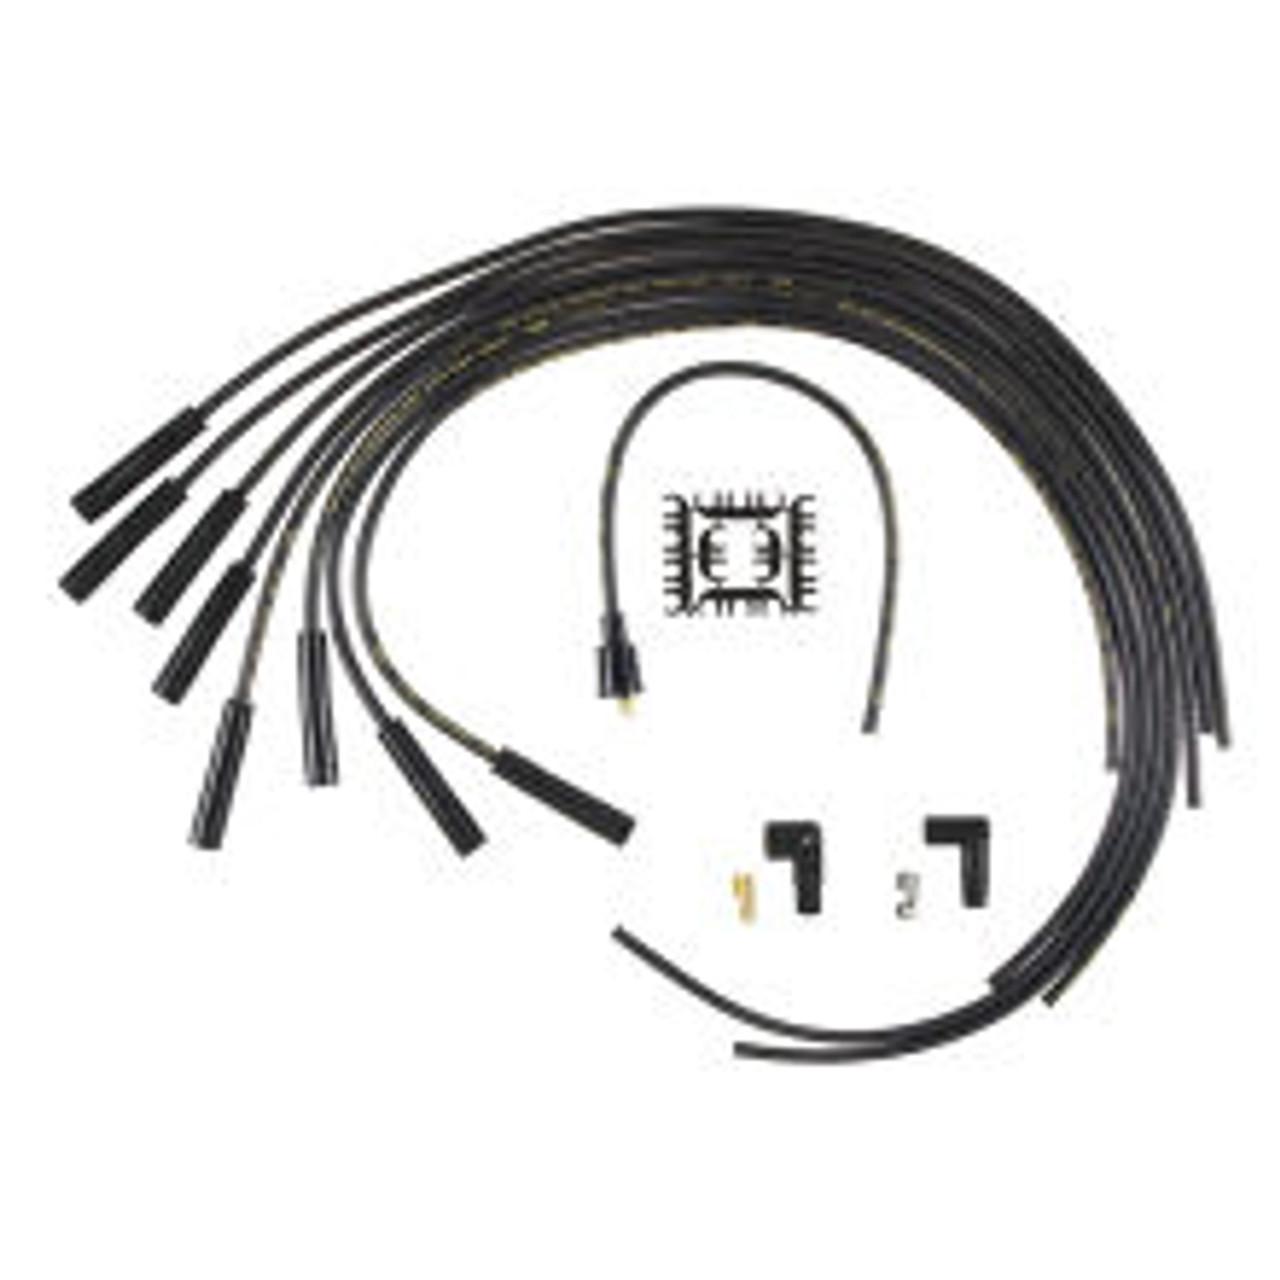 Spark Plug Wire Set-Universal Fit Accel 4040